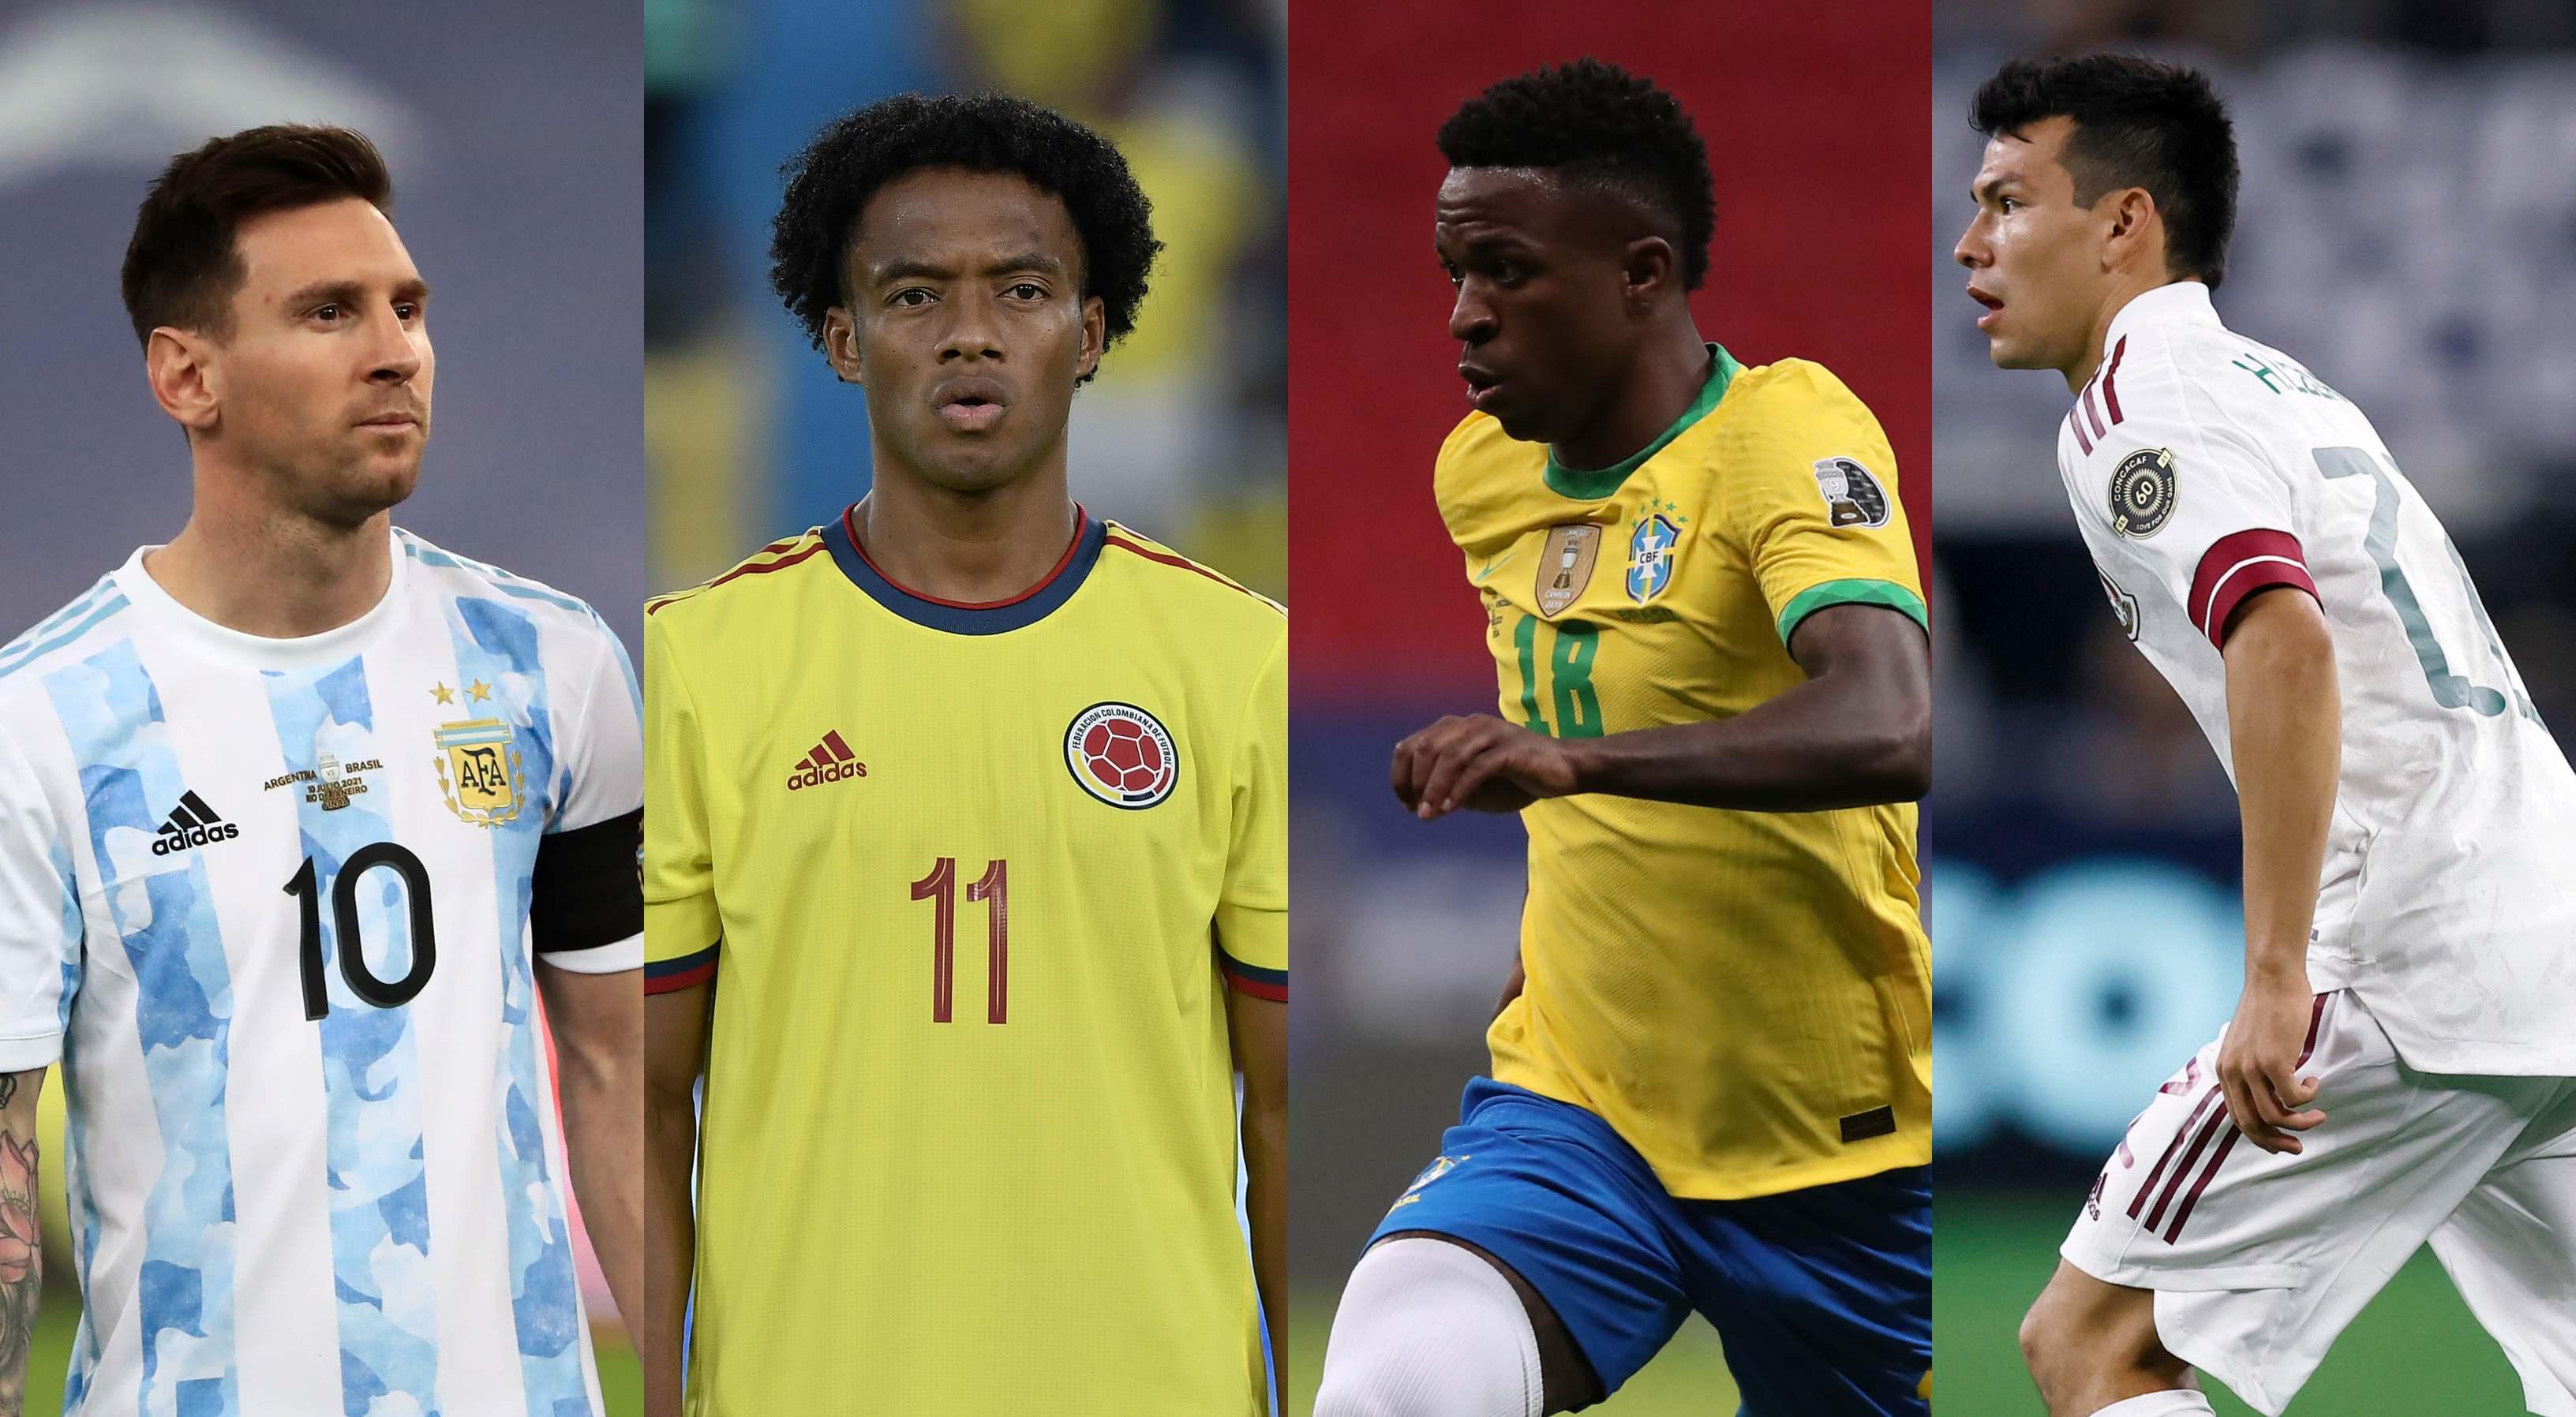 Eliminatorias a Qatar 2022: minuto a minuto   CNN